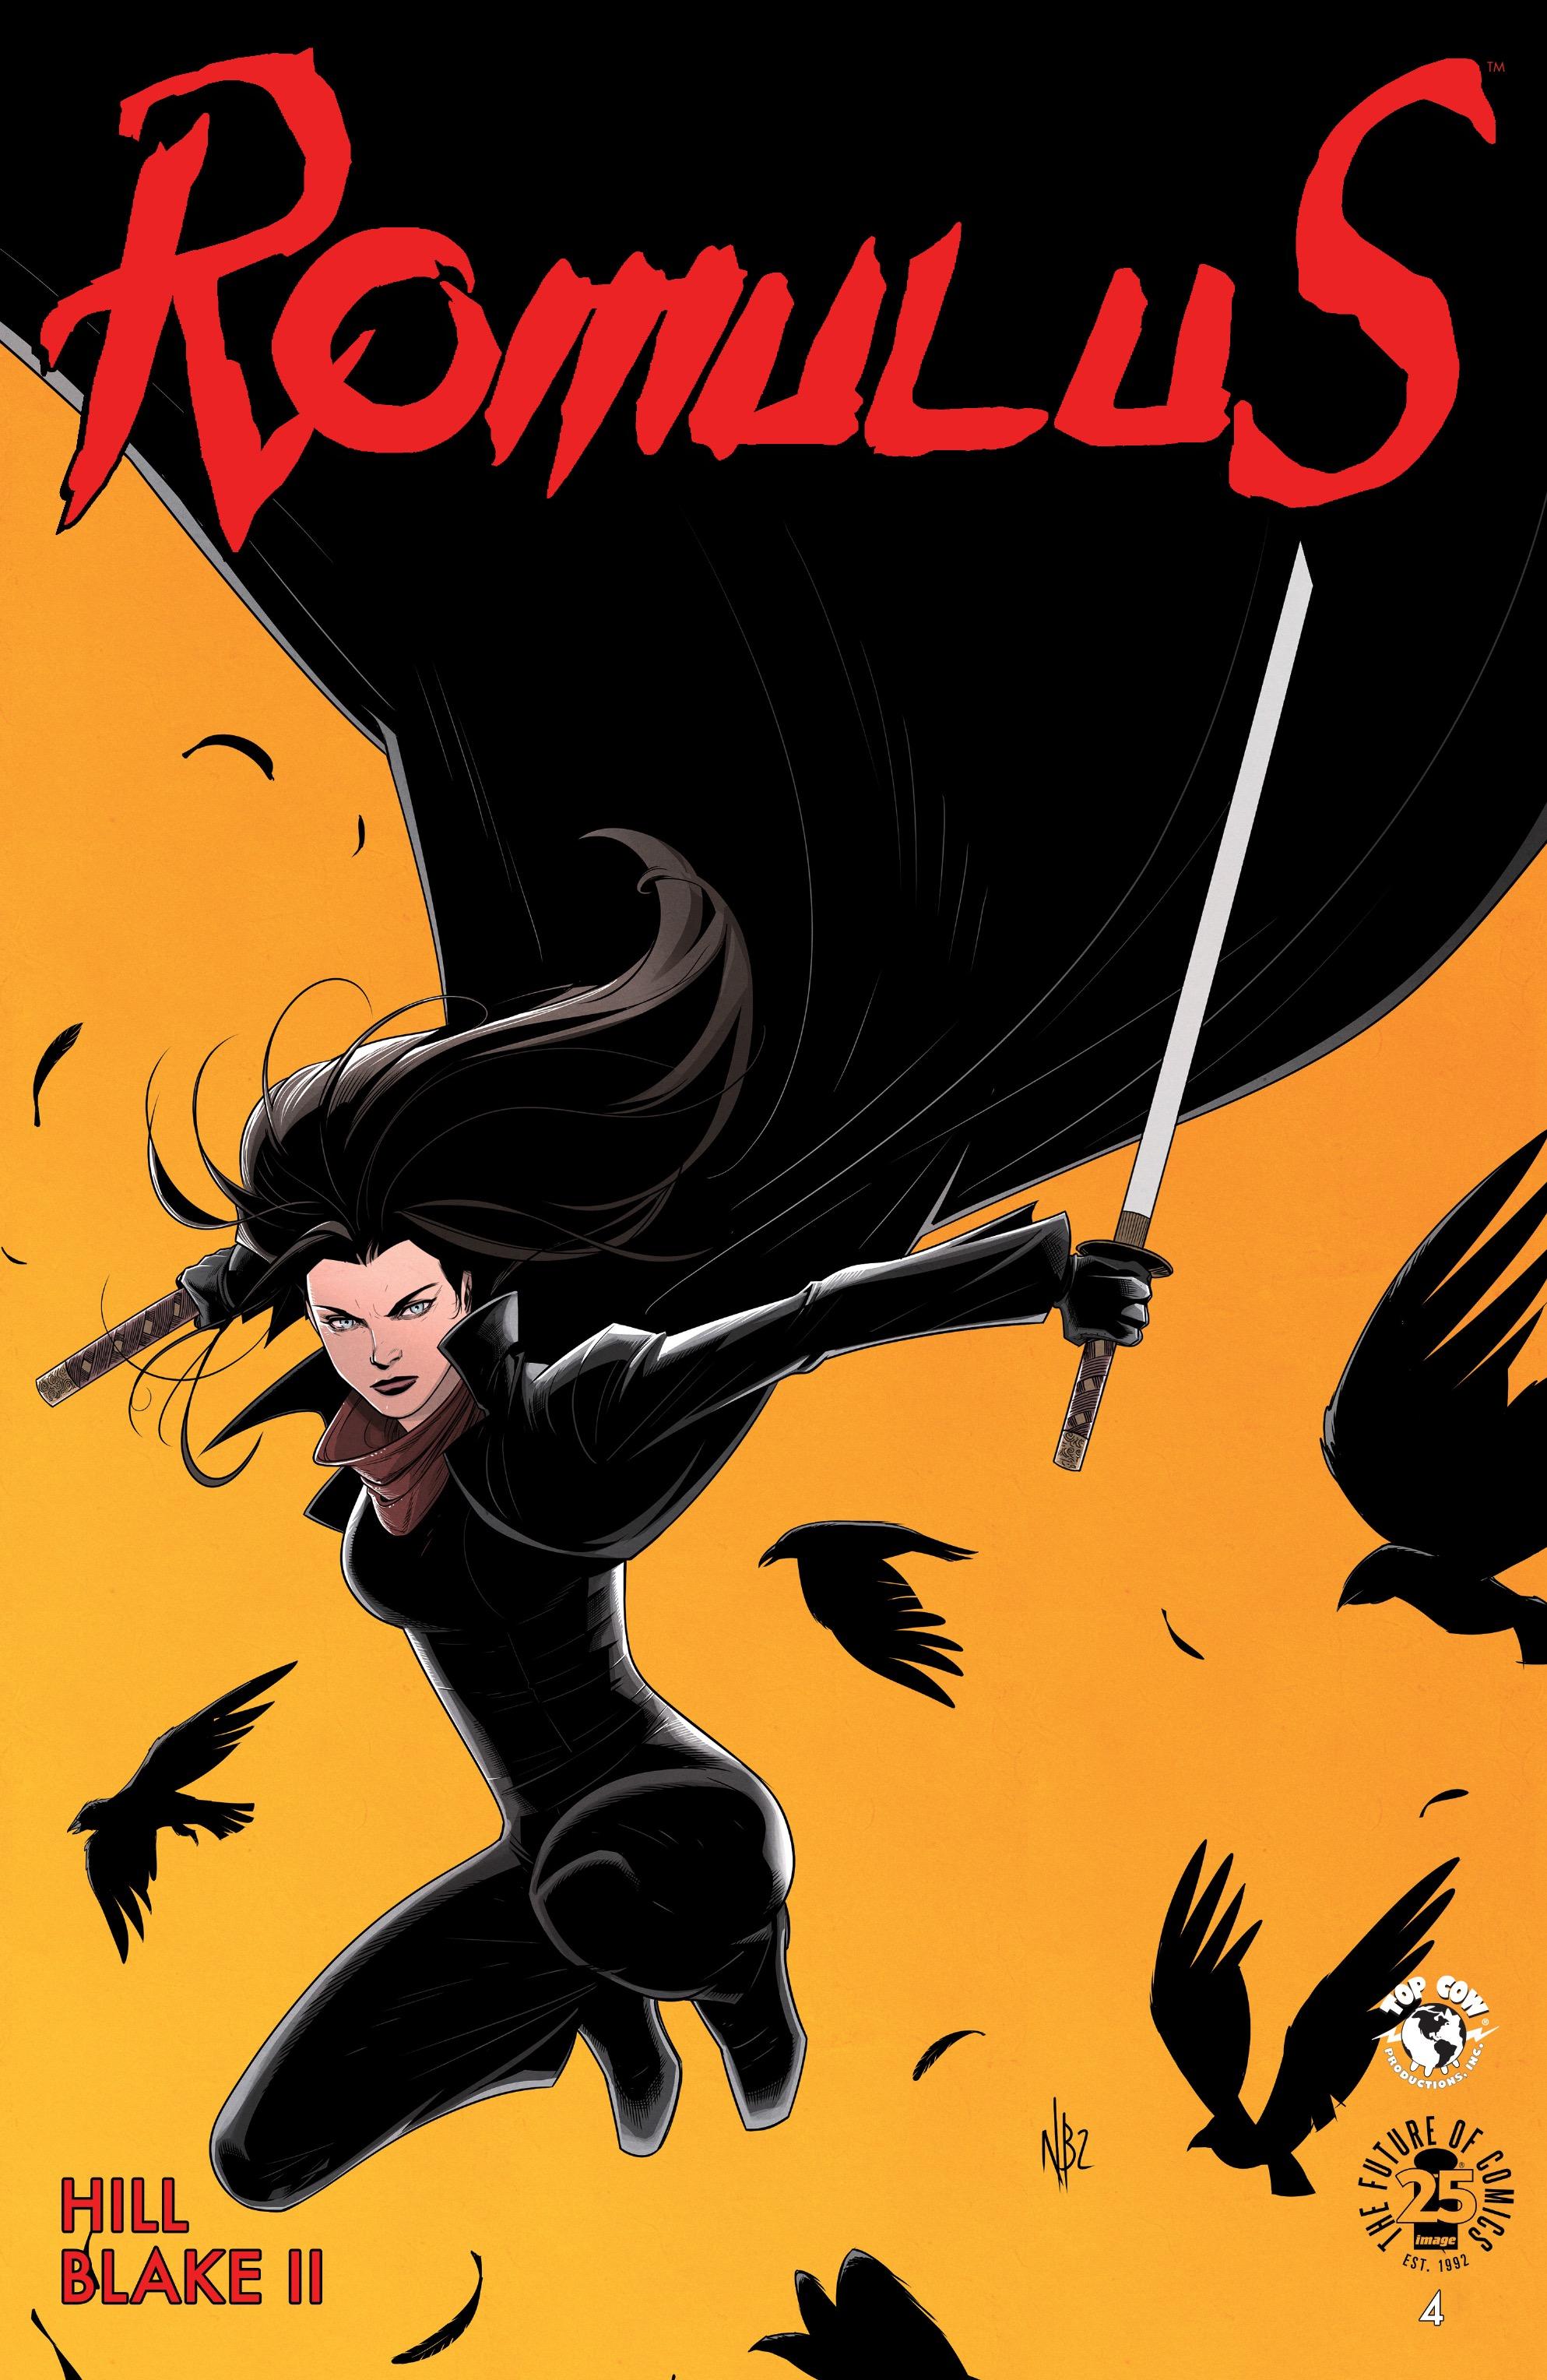 Read online Romulus comic -  Issue #4 - 1